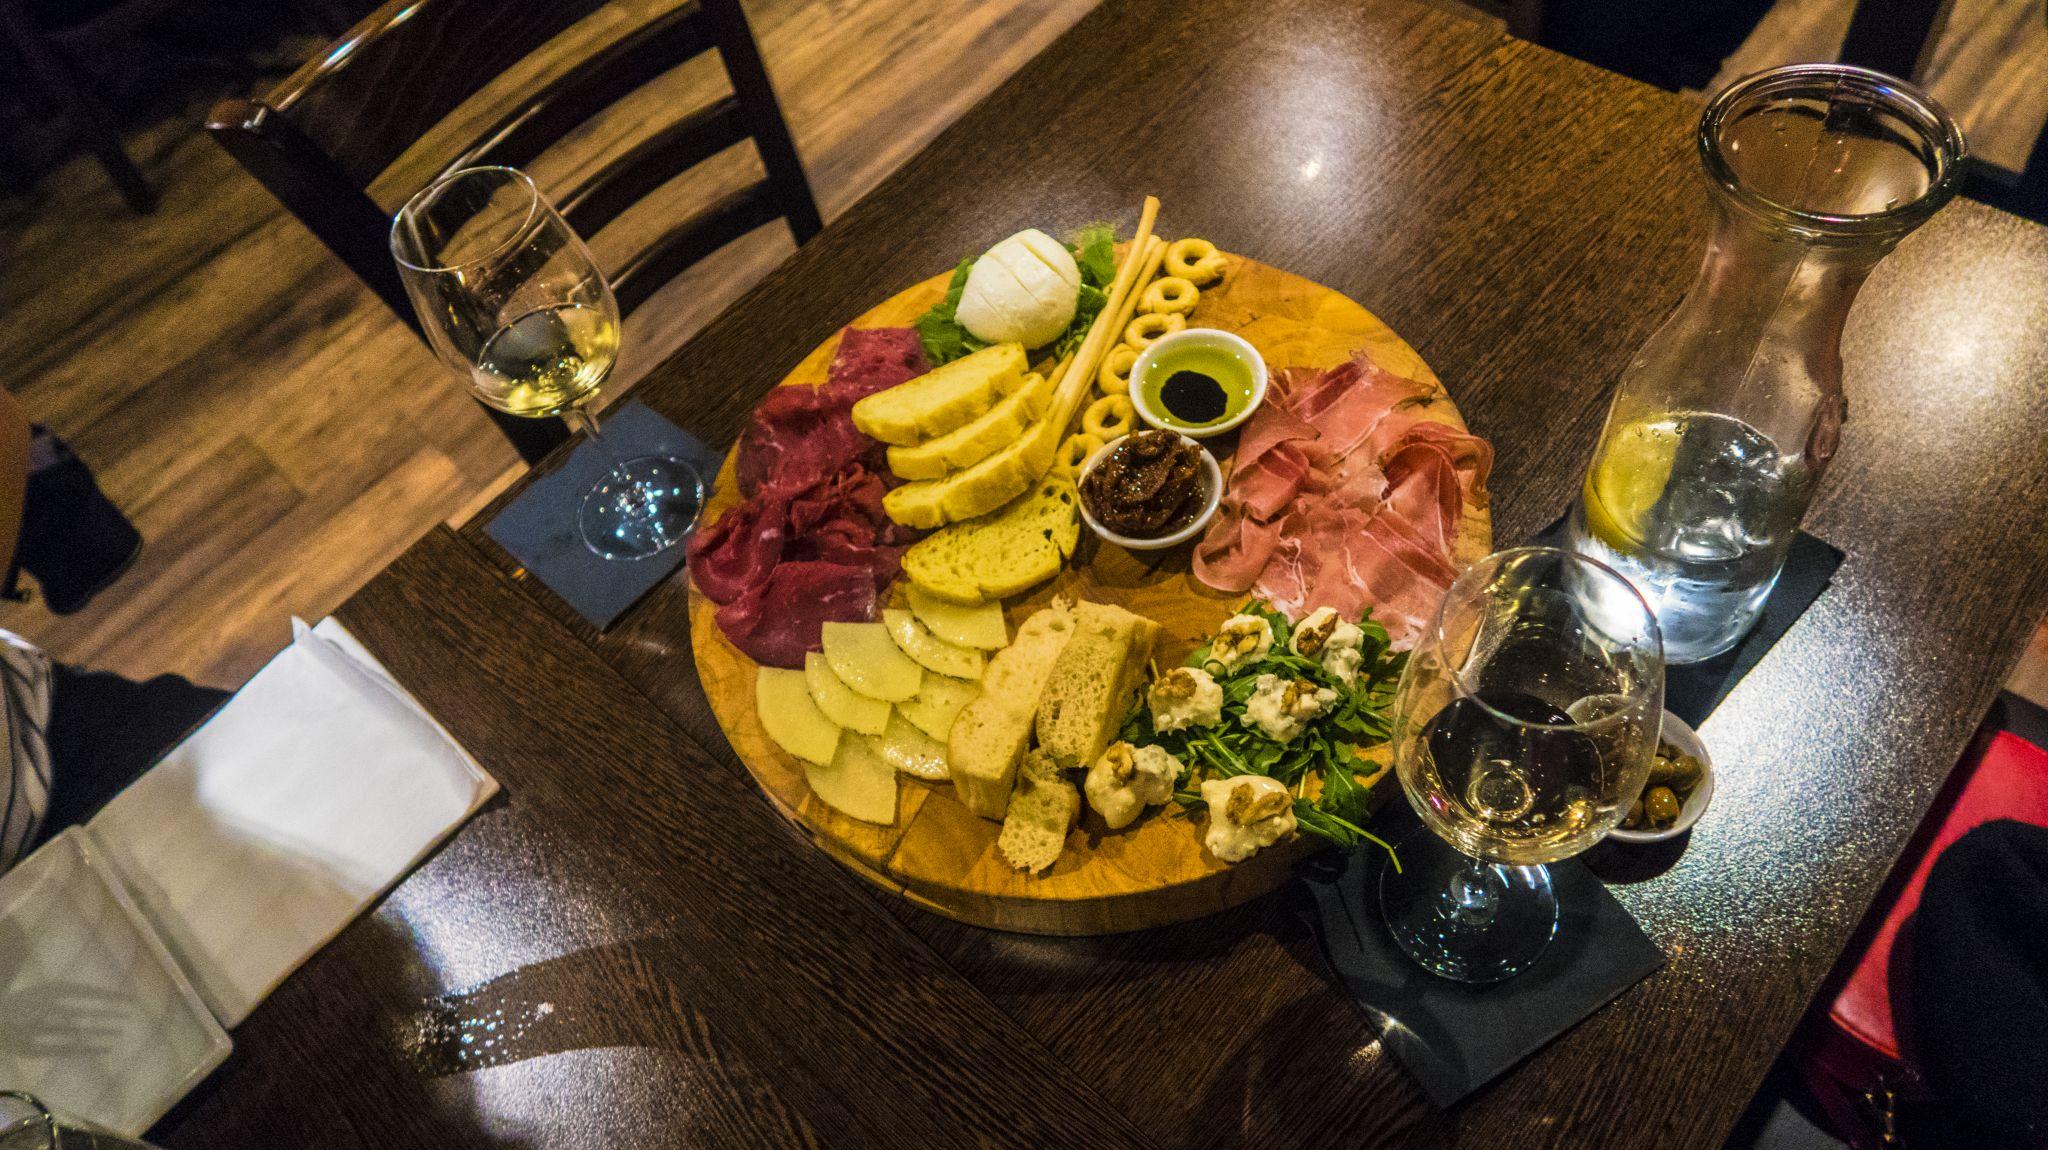 Veeno Liverpool Wine Tasting Food Menu Sharing Platter Board